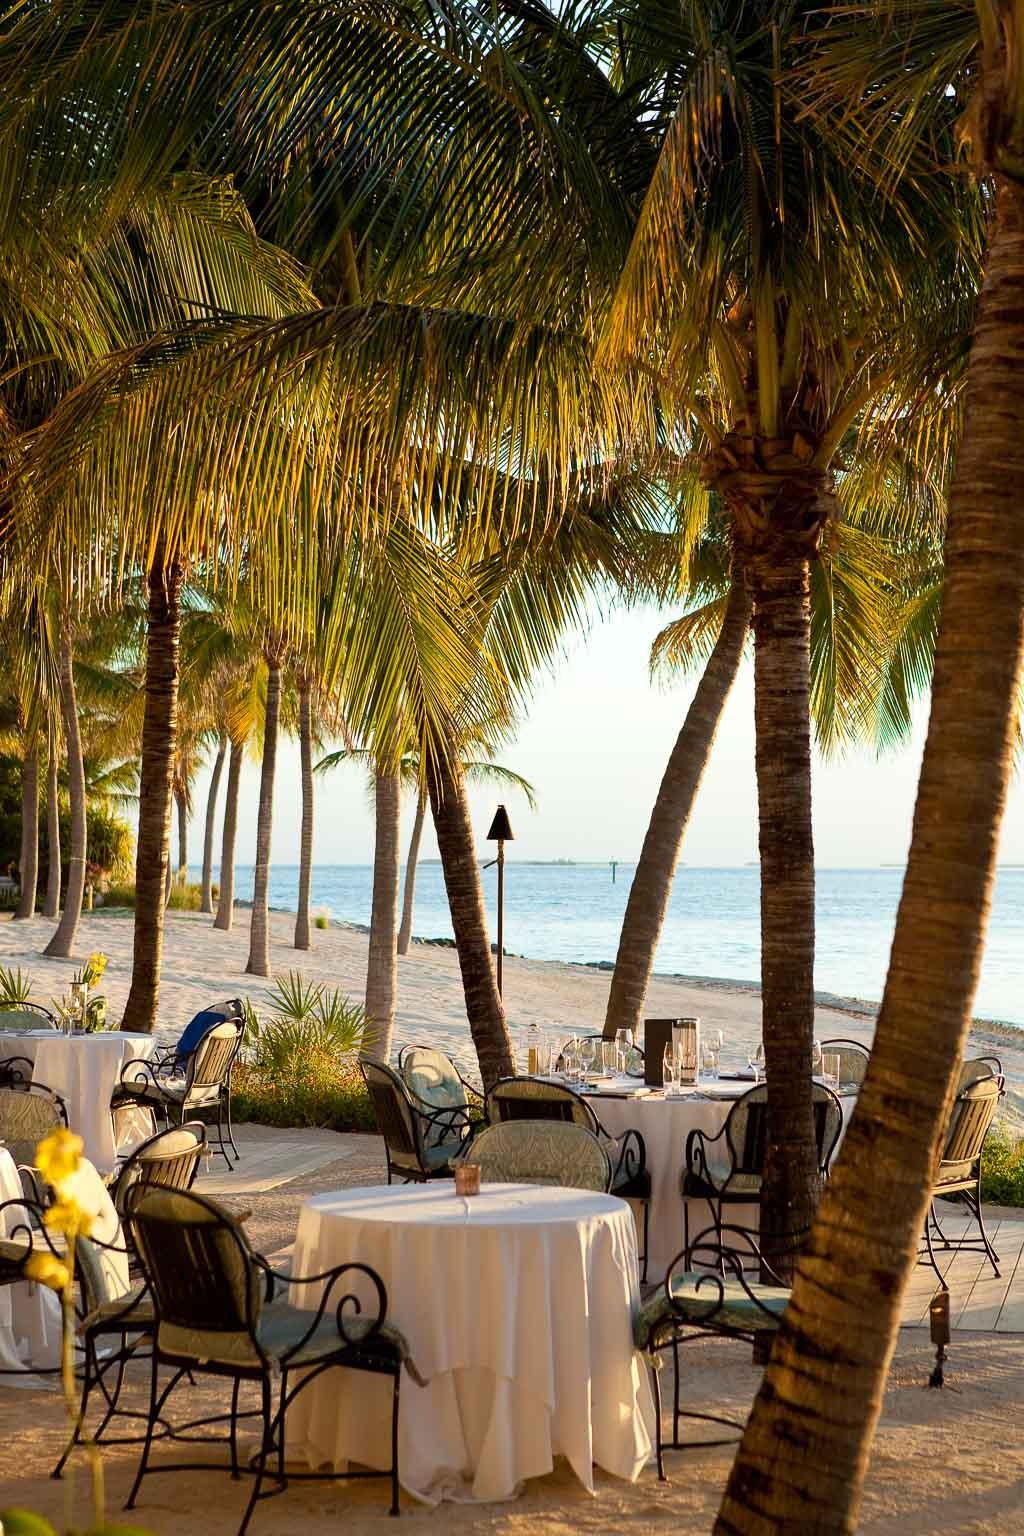 Tische am Strand (c) Latitudes at Sunset Key Florida Keys